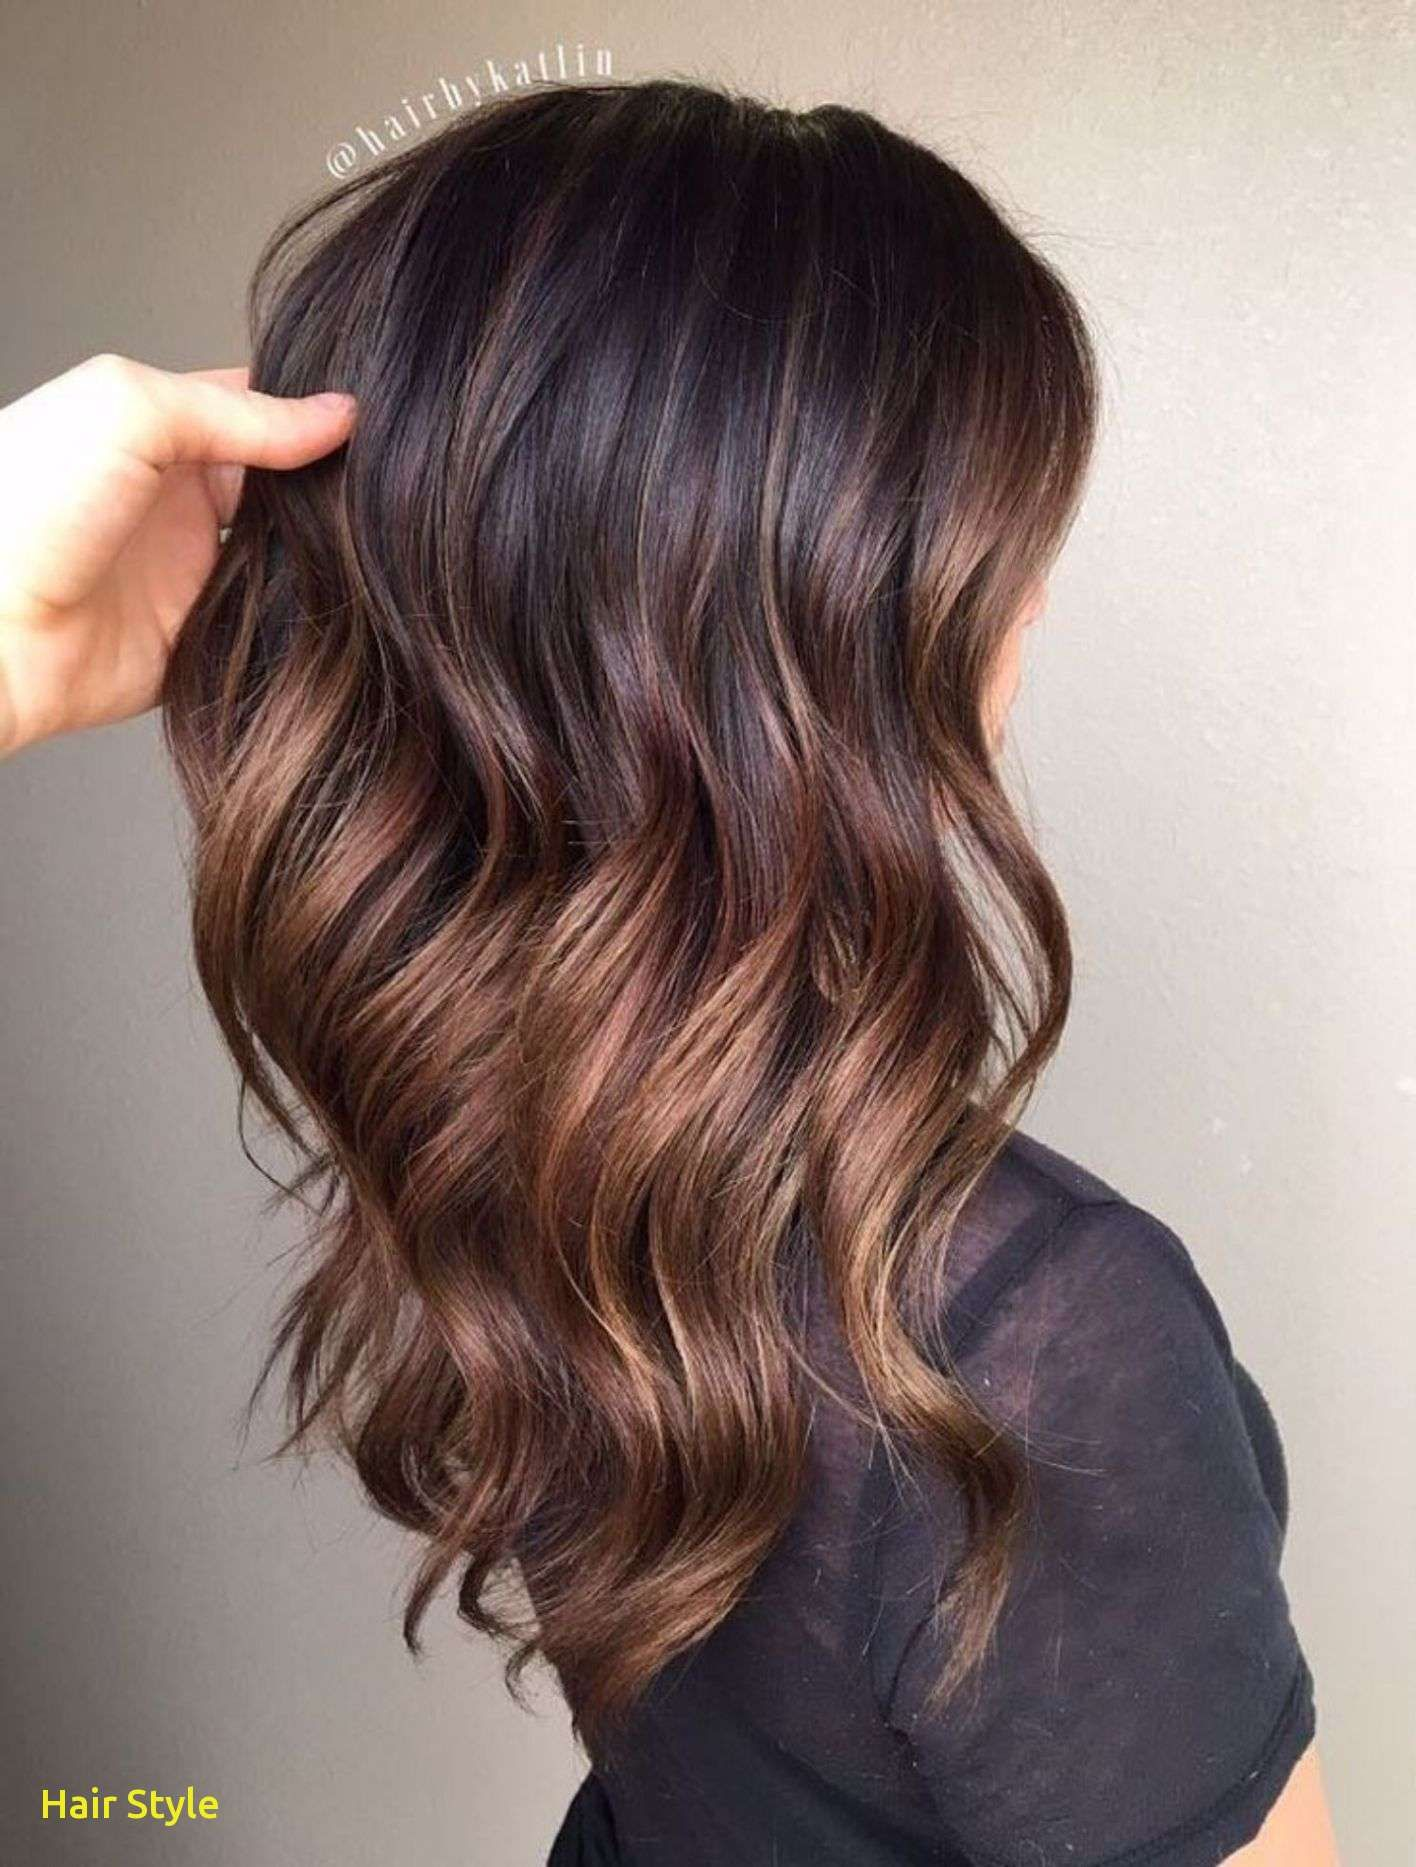 Schöne beste Haarfarbe Ideen für dunkles Haar #fallhaircolors